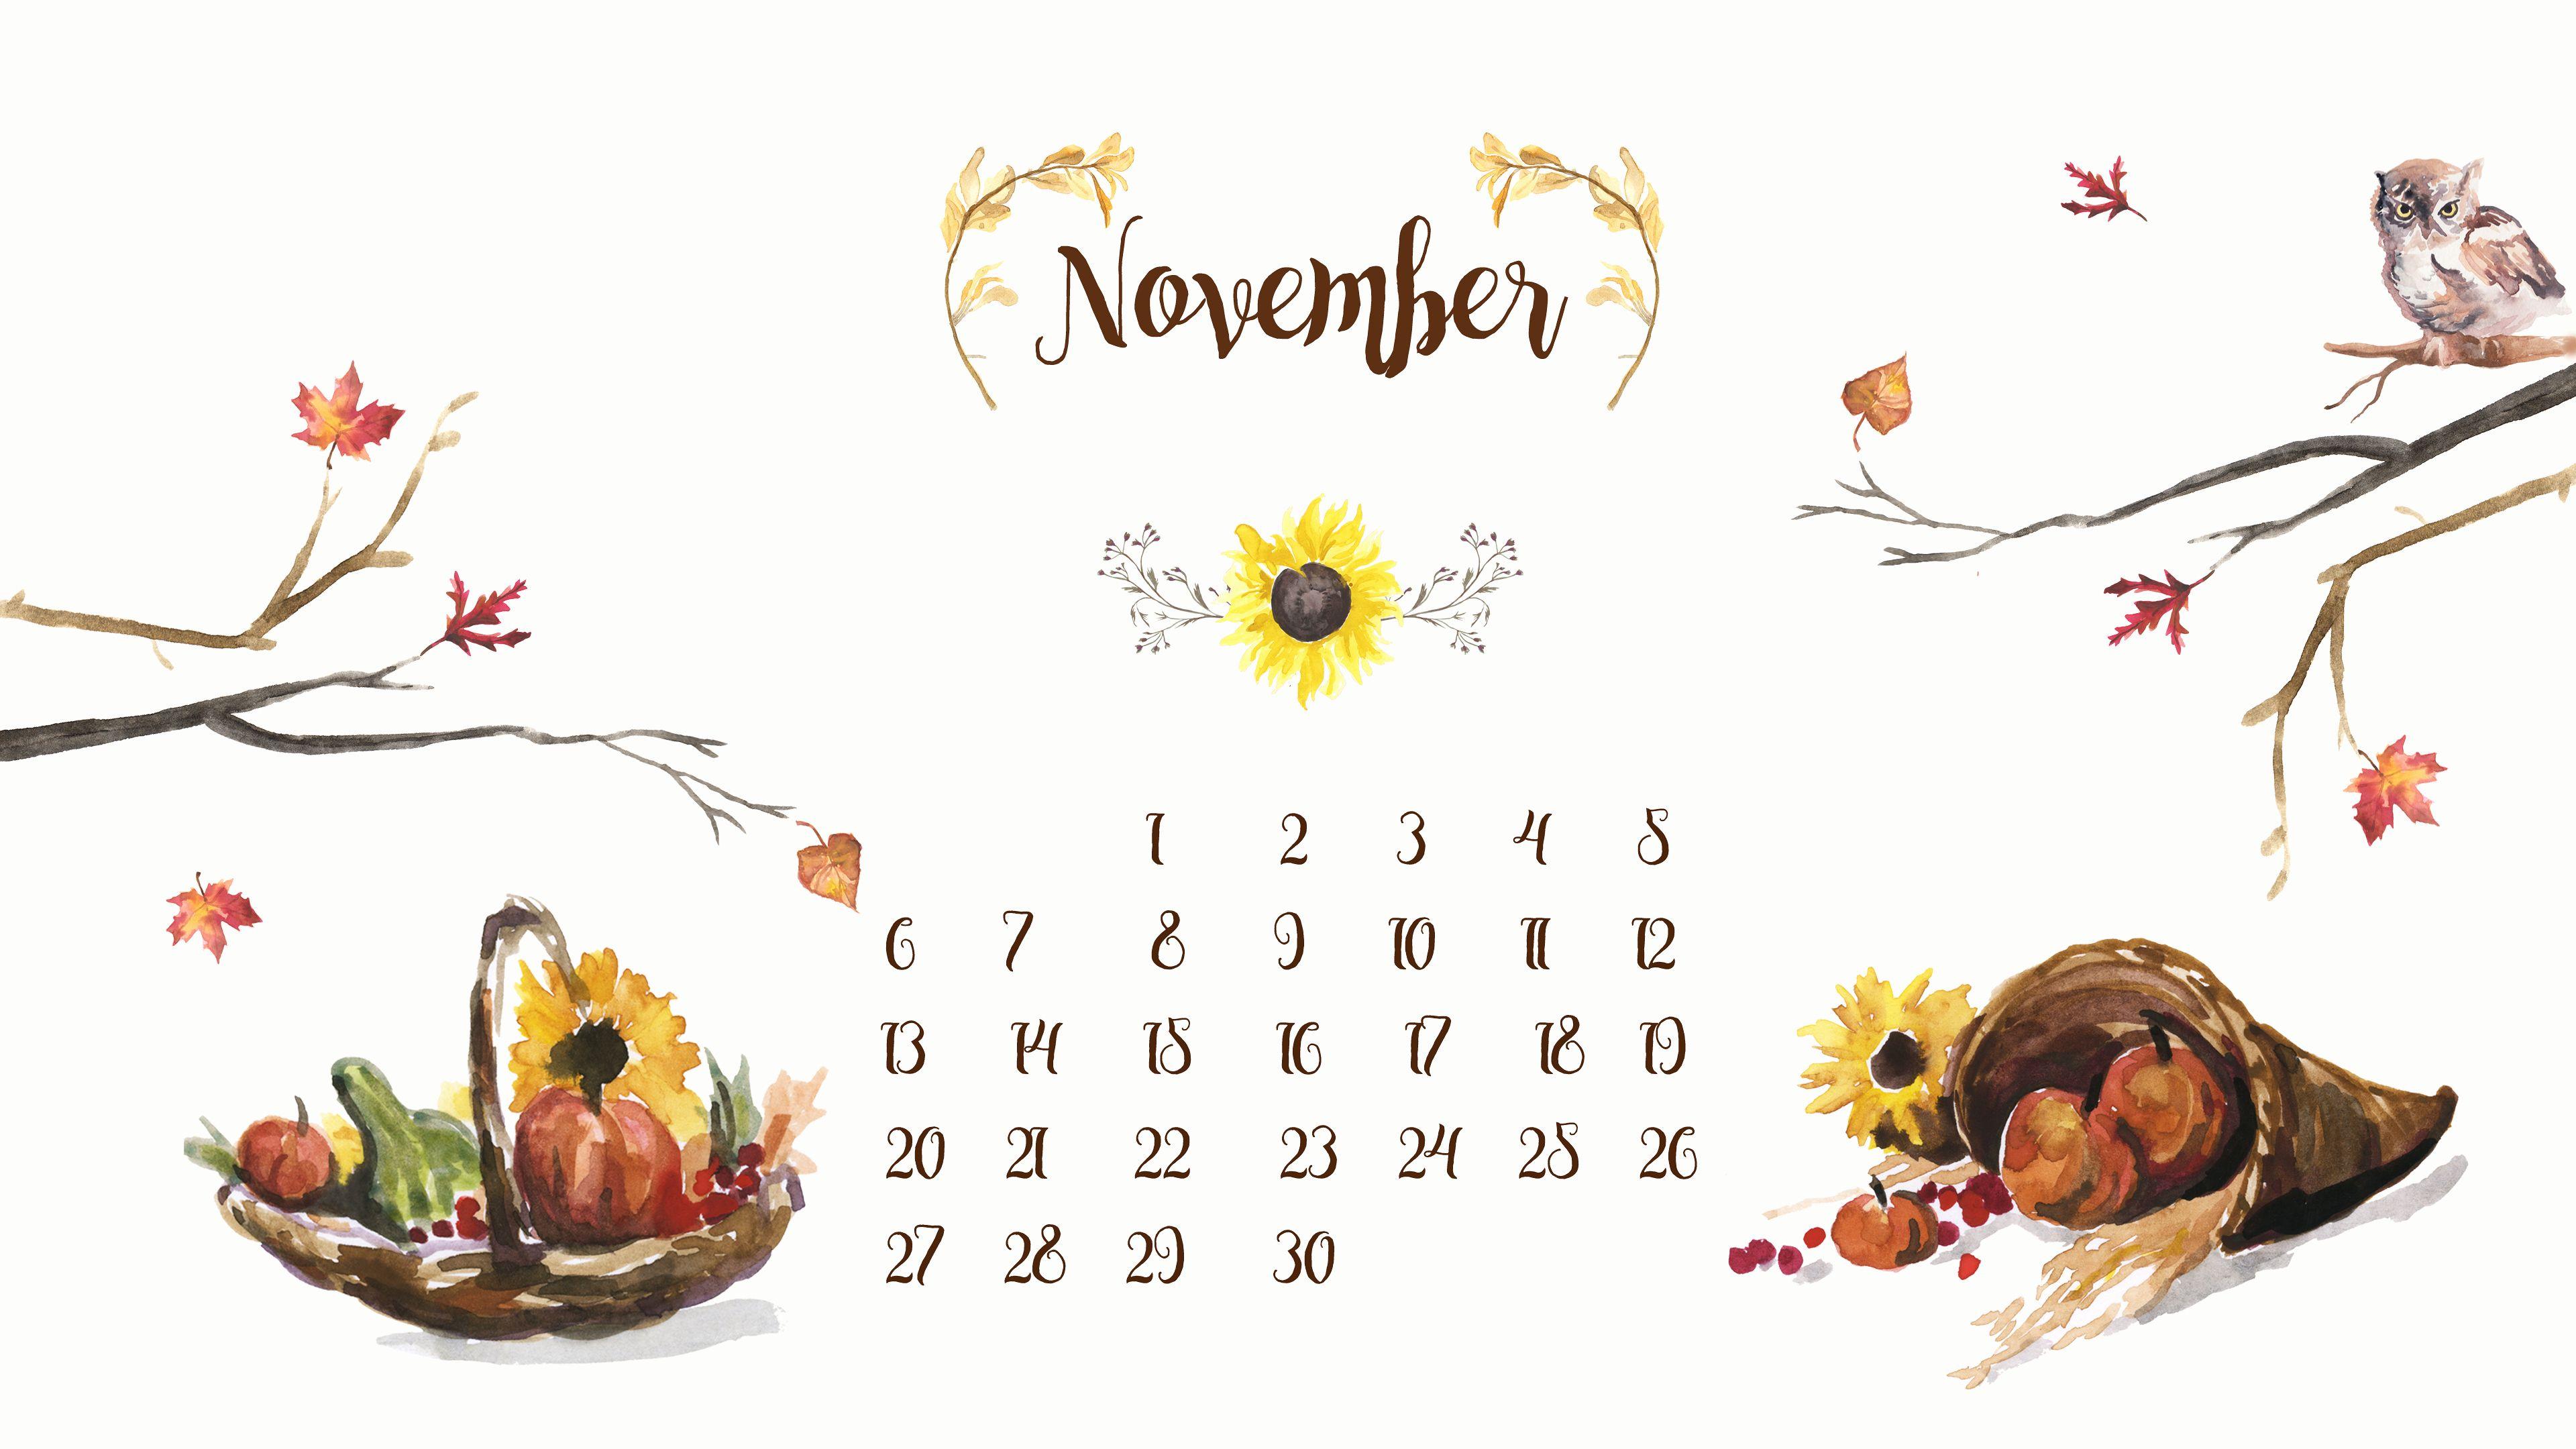 Ноябрь картинки с календарем